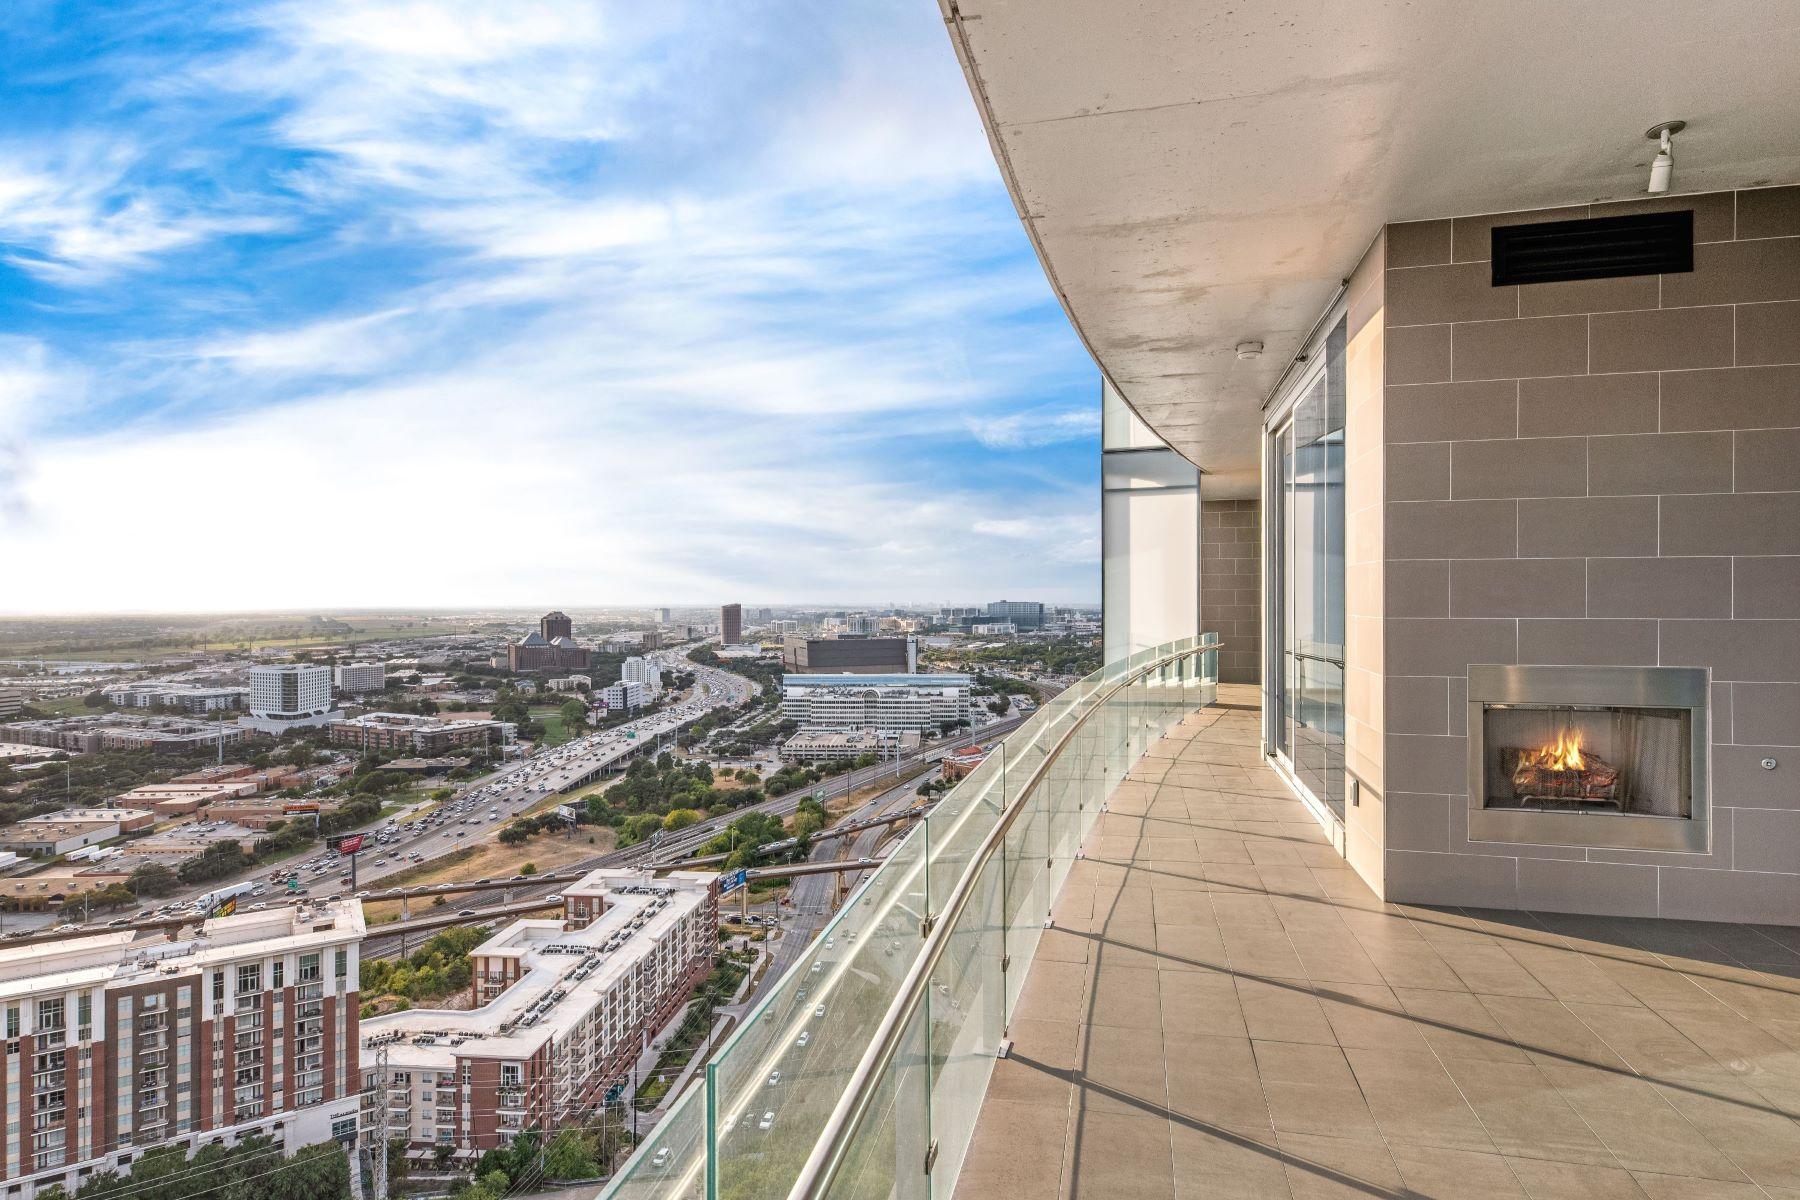 Condominiums for Active at Elite Bleu Ciel Condo 3130 N. Harwood Street #2901 Dallas, Texas 75201 United States